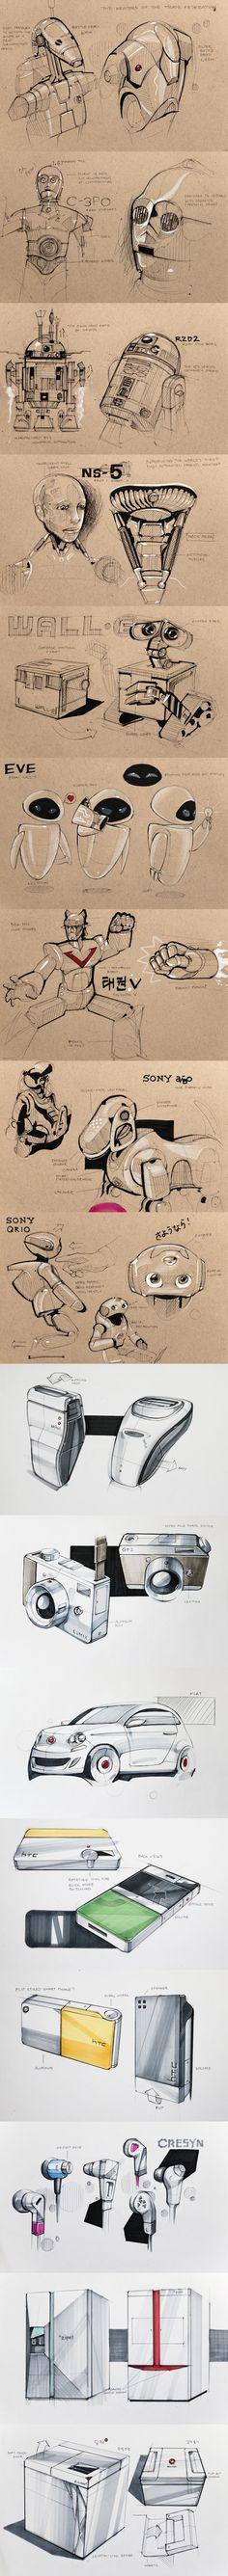 Sketches - 1 — Minimally Minimal